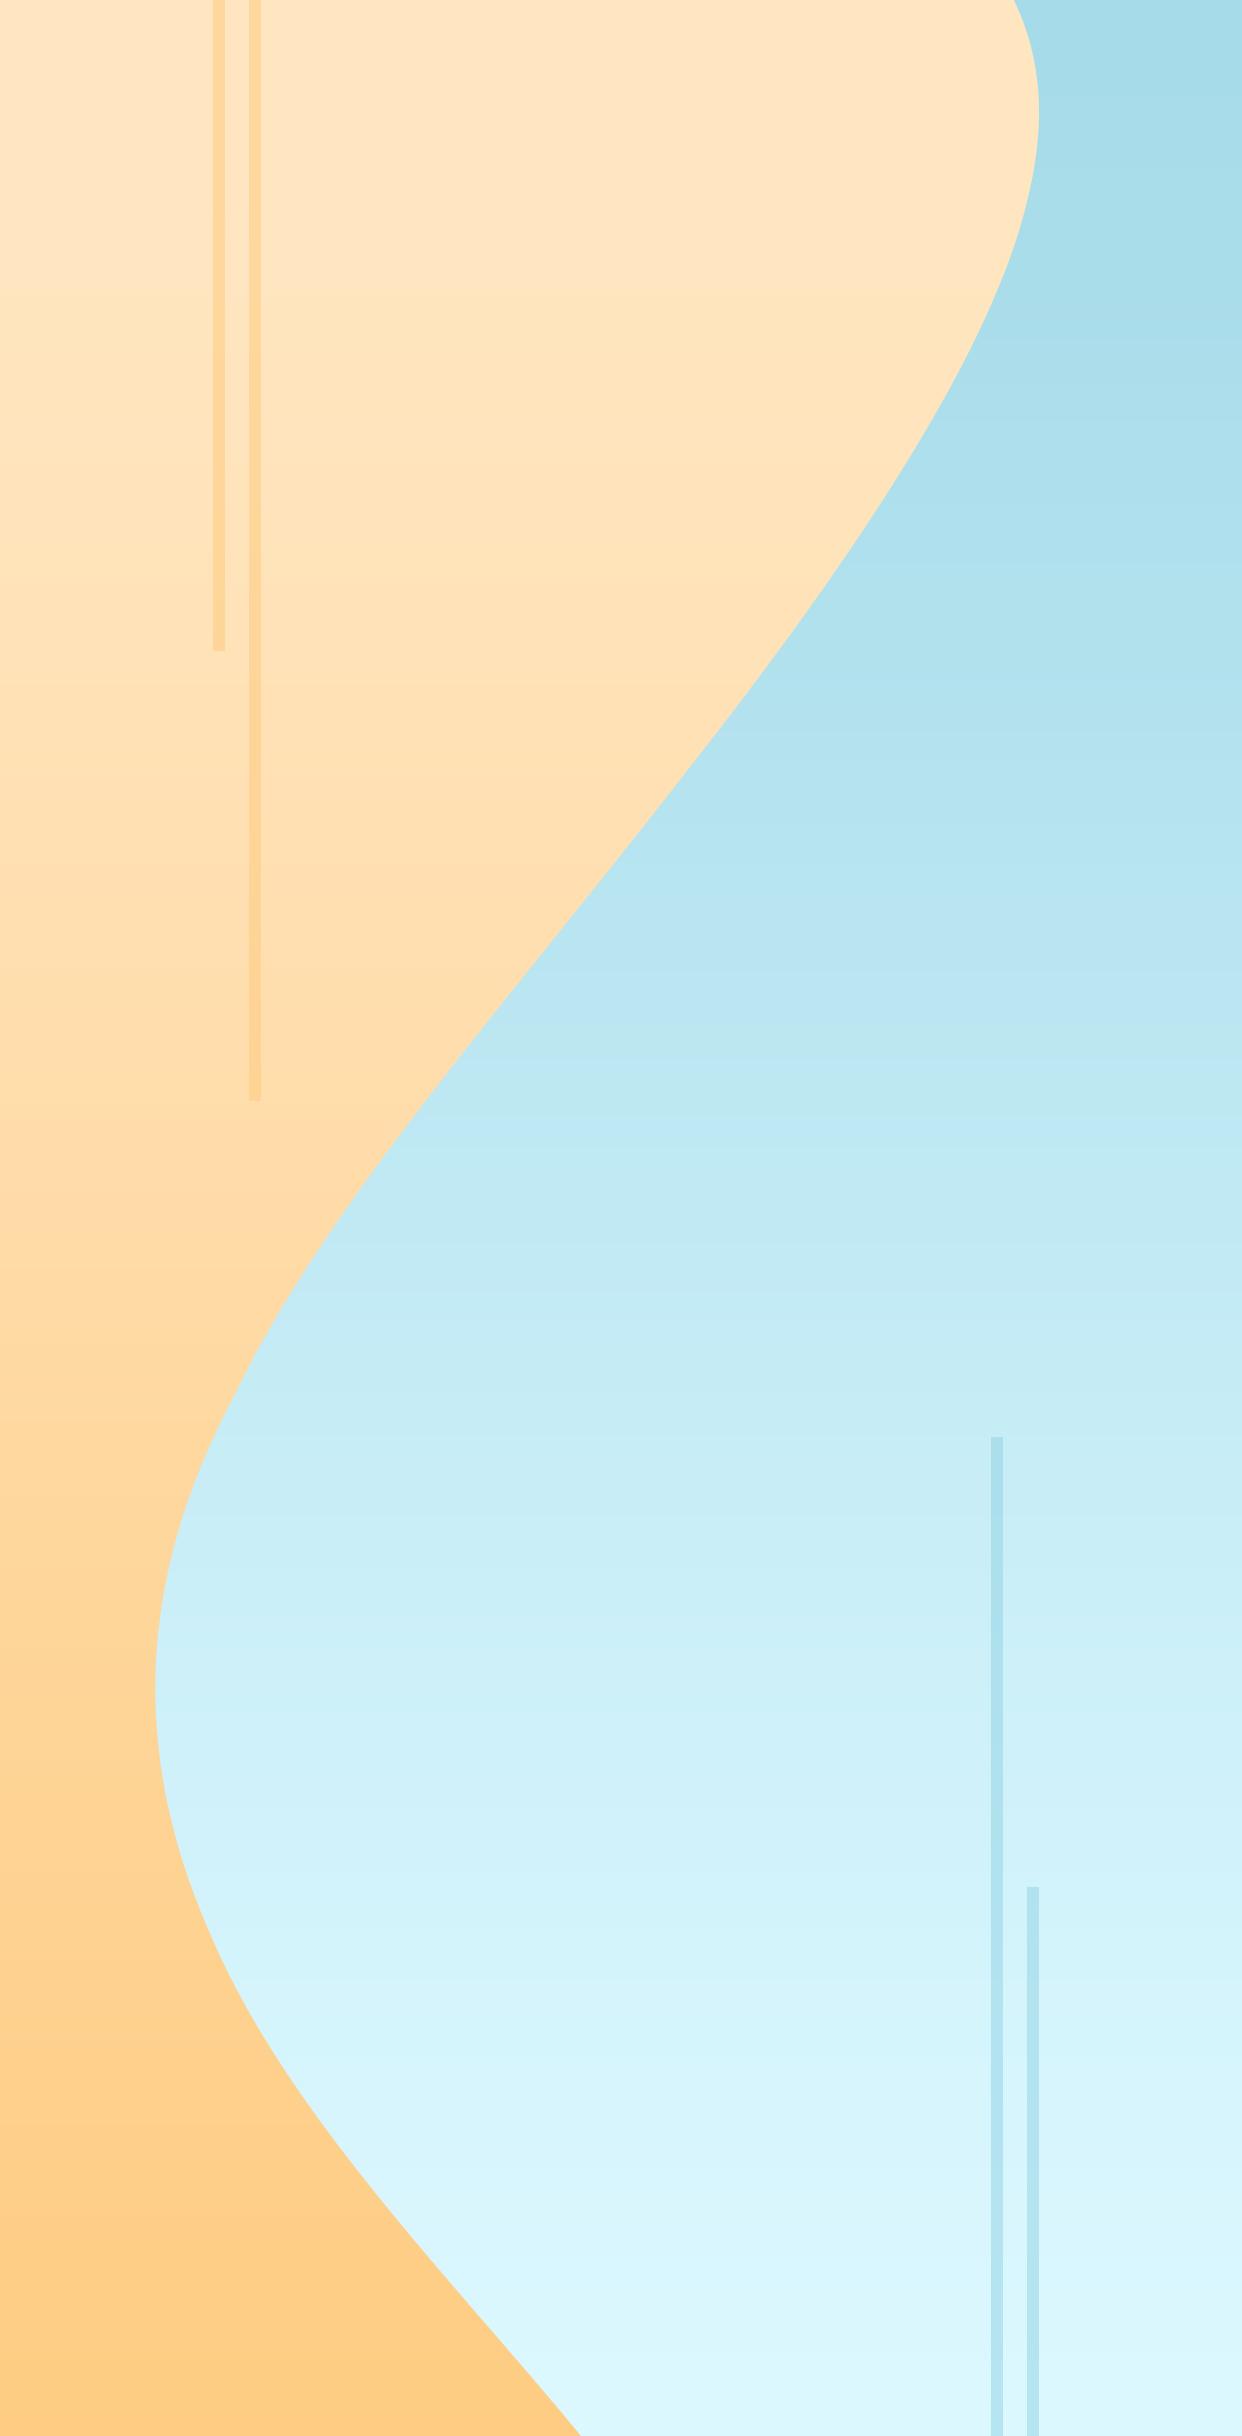 Free Iphone Wallpaper Background Minimalism Style Gradient - Background Color Iphone - HD Wallpaper